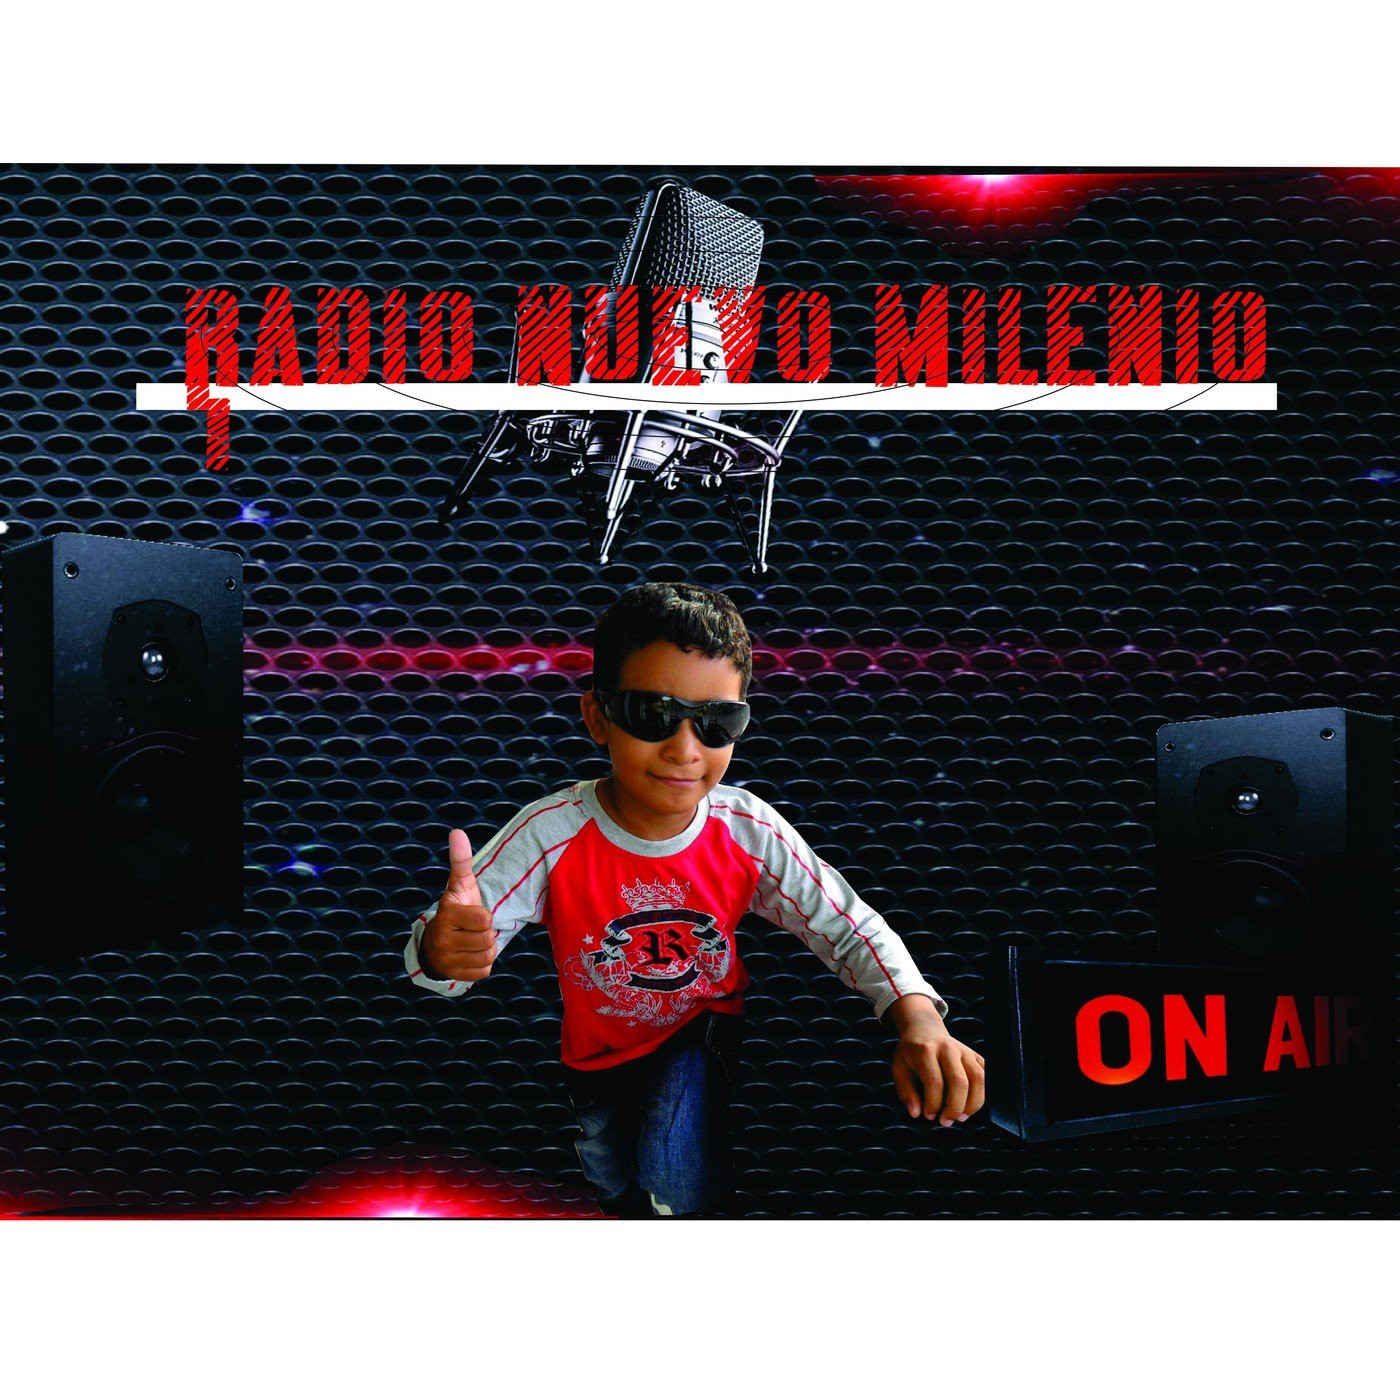 Escucha radio nuevo milenio ivoox for 4 milenio ultimo programa